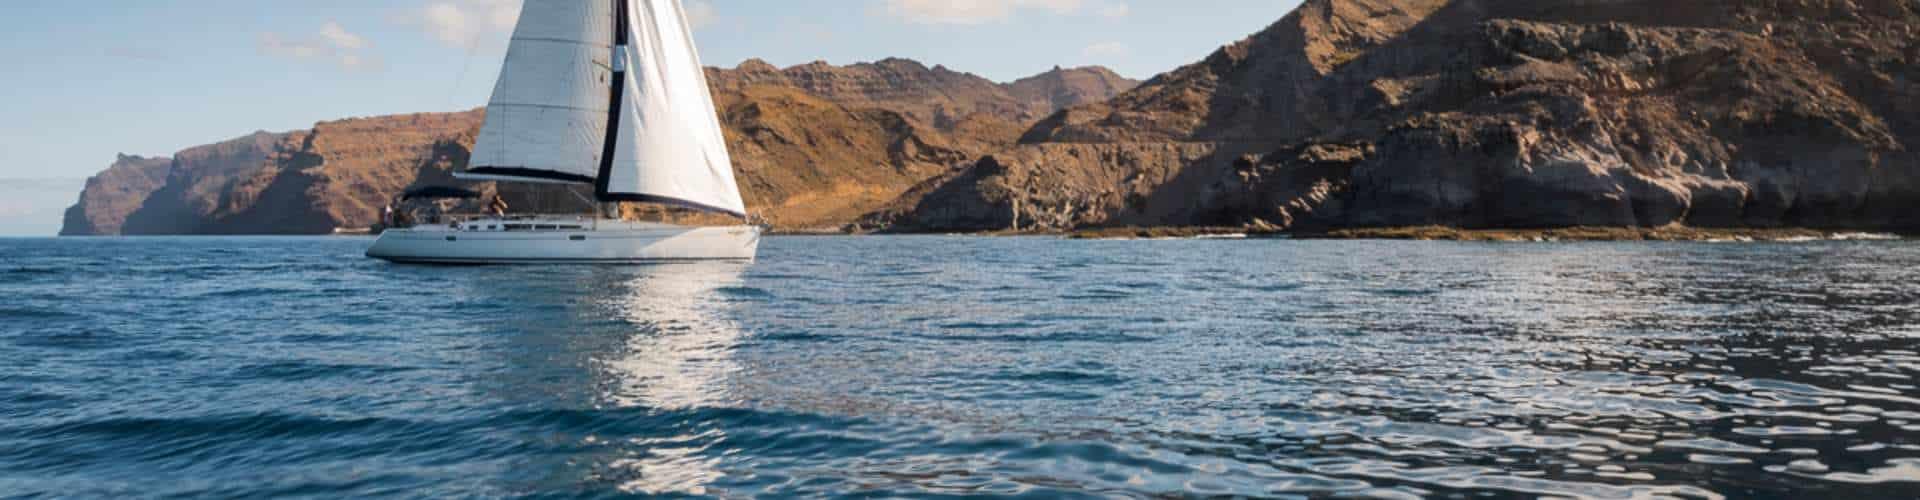 Karolka Mogan sailing boat trip